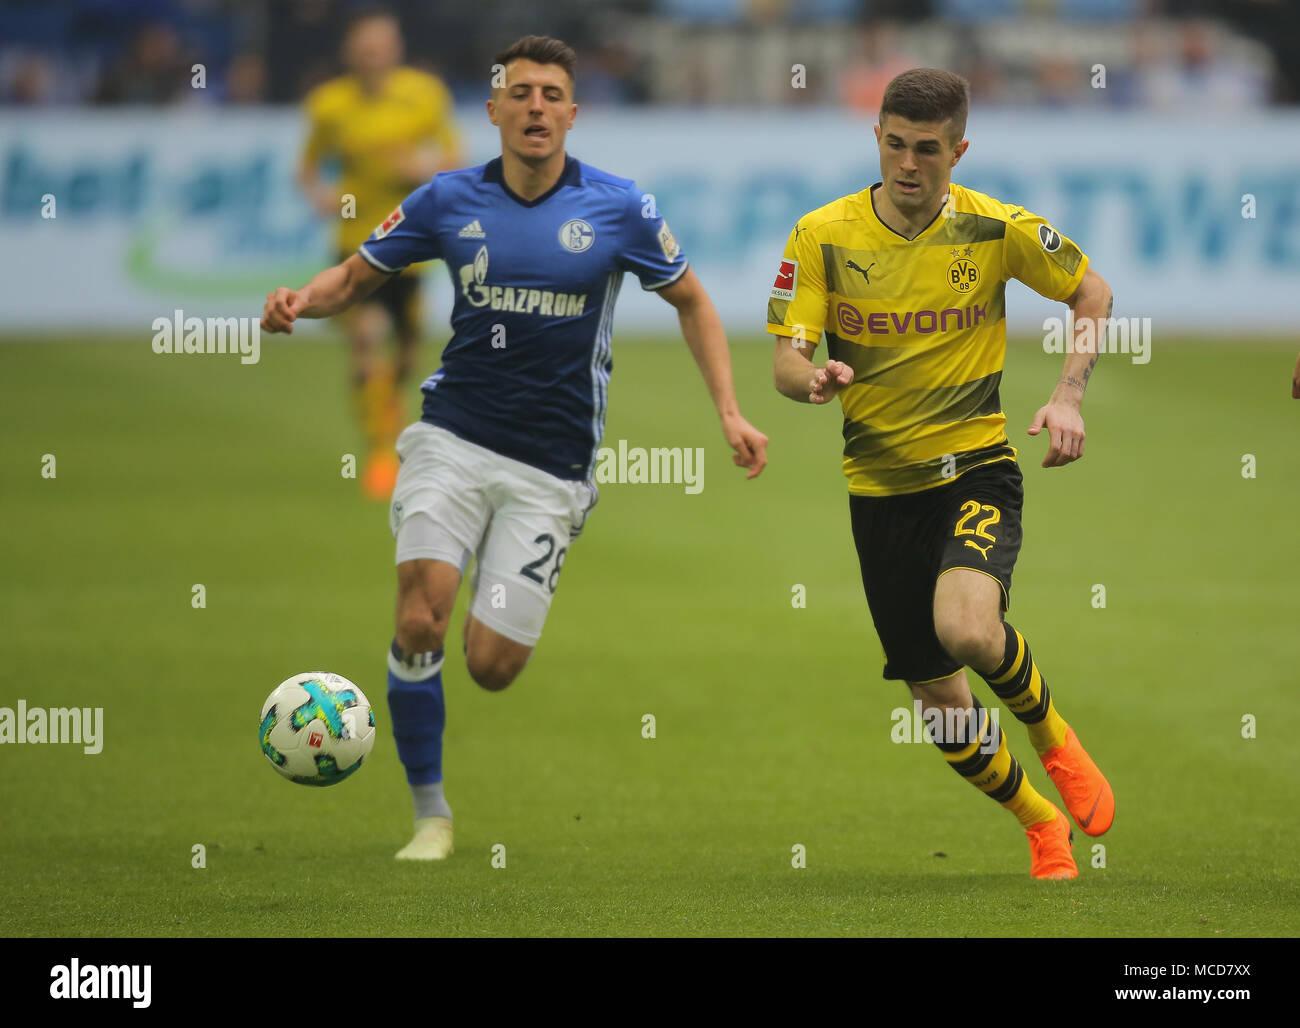 Gelsenkirchen, Germania 15 aprile 2018, Bundesliga giornata 30, FC Schalke 04 vs BV Borussia Dortmund: Alessandro Andre Schoepf (Schalke) e Christian Pulisic (Dortmund) in concorrenza. Credito: Juergen schwarz/Alamy Live News Foto Stock